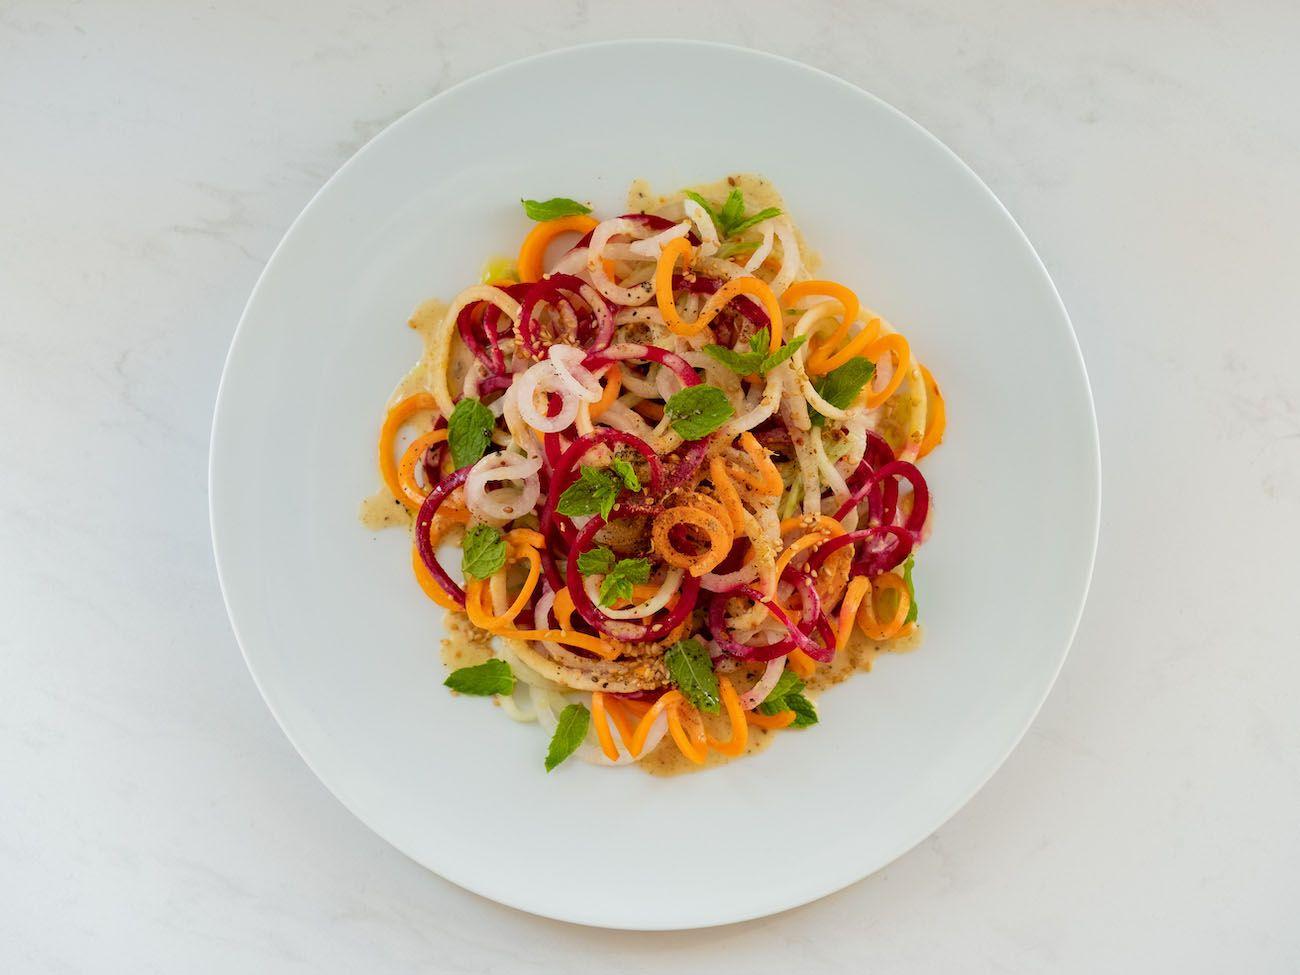 About Fuel, Foodblog, Rezept, Bunter Spiralensalat mit Tahini-Dressing, Gurke, Minze, Rote Bete, Salat